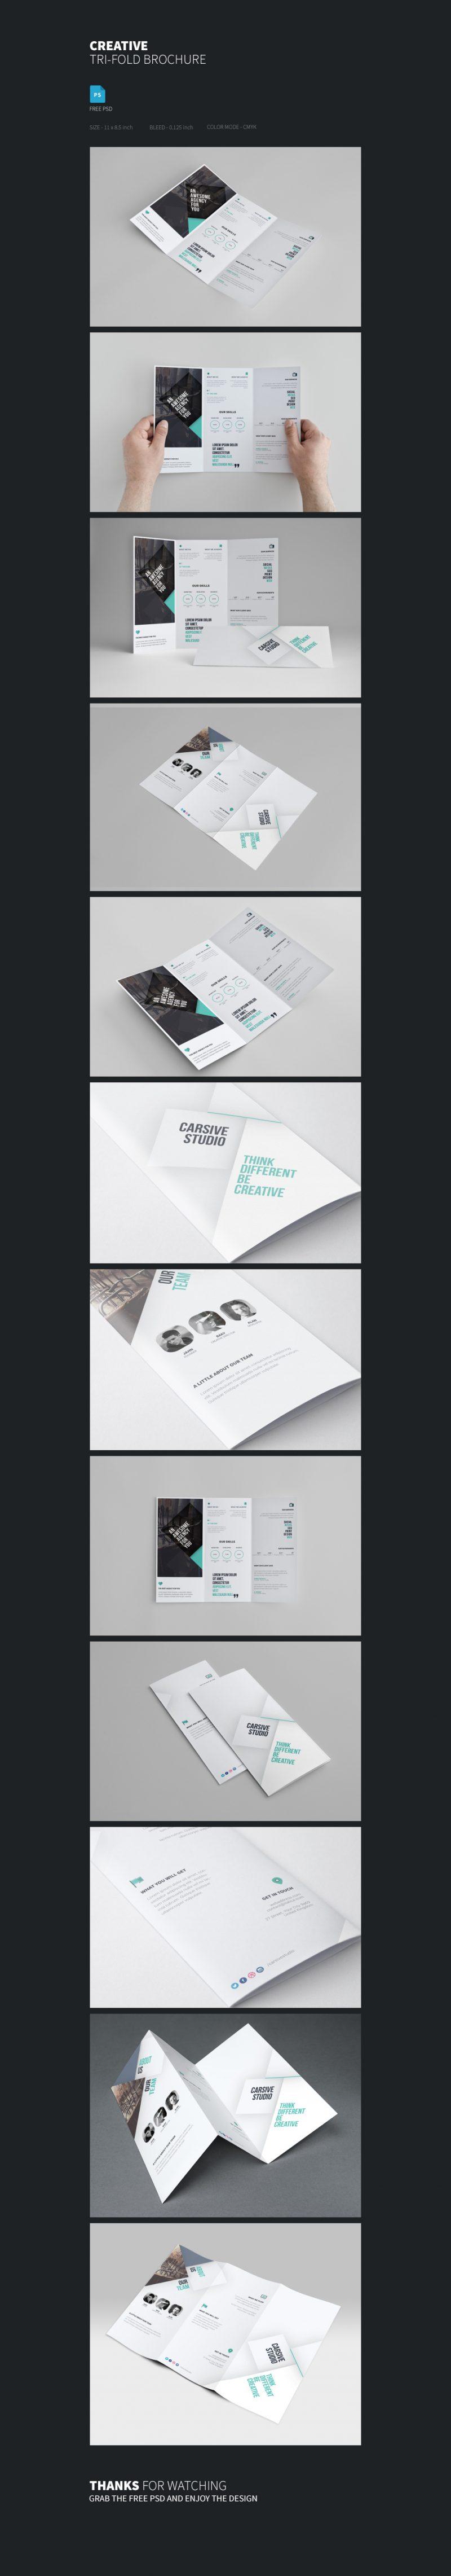 Creative Tri-fold Brochure Template Free PSD